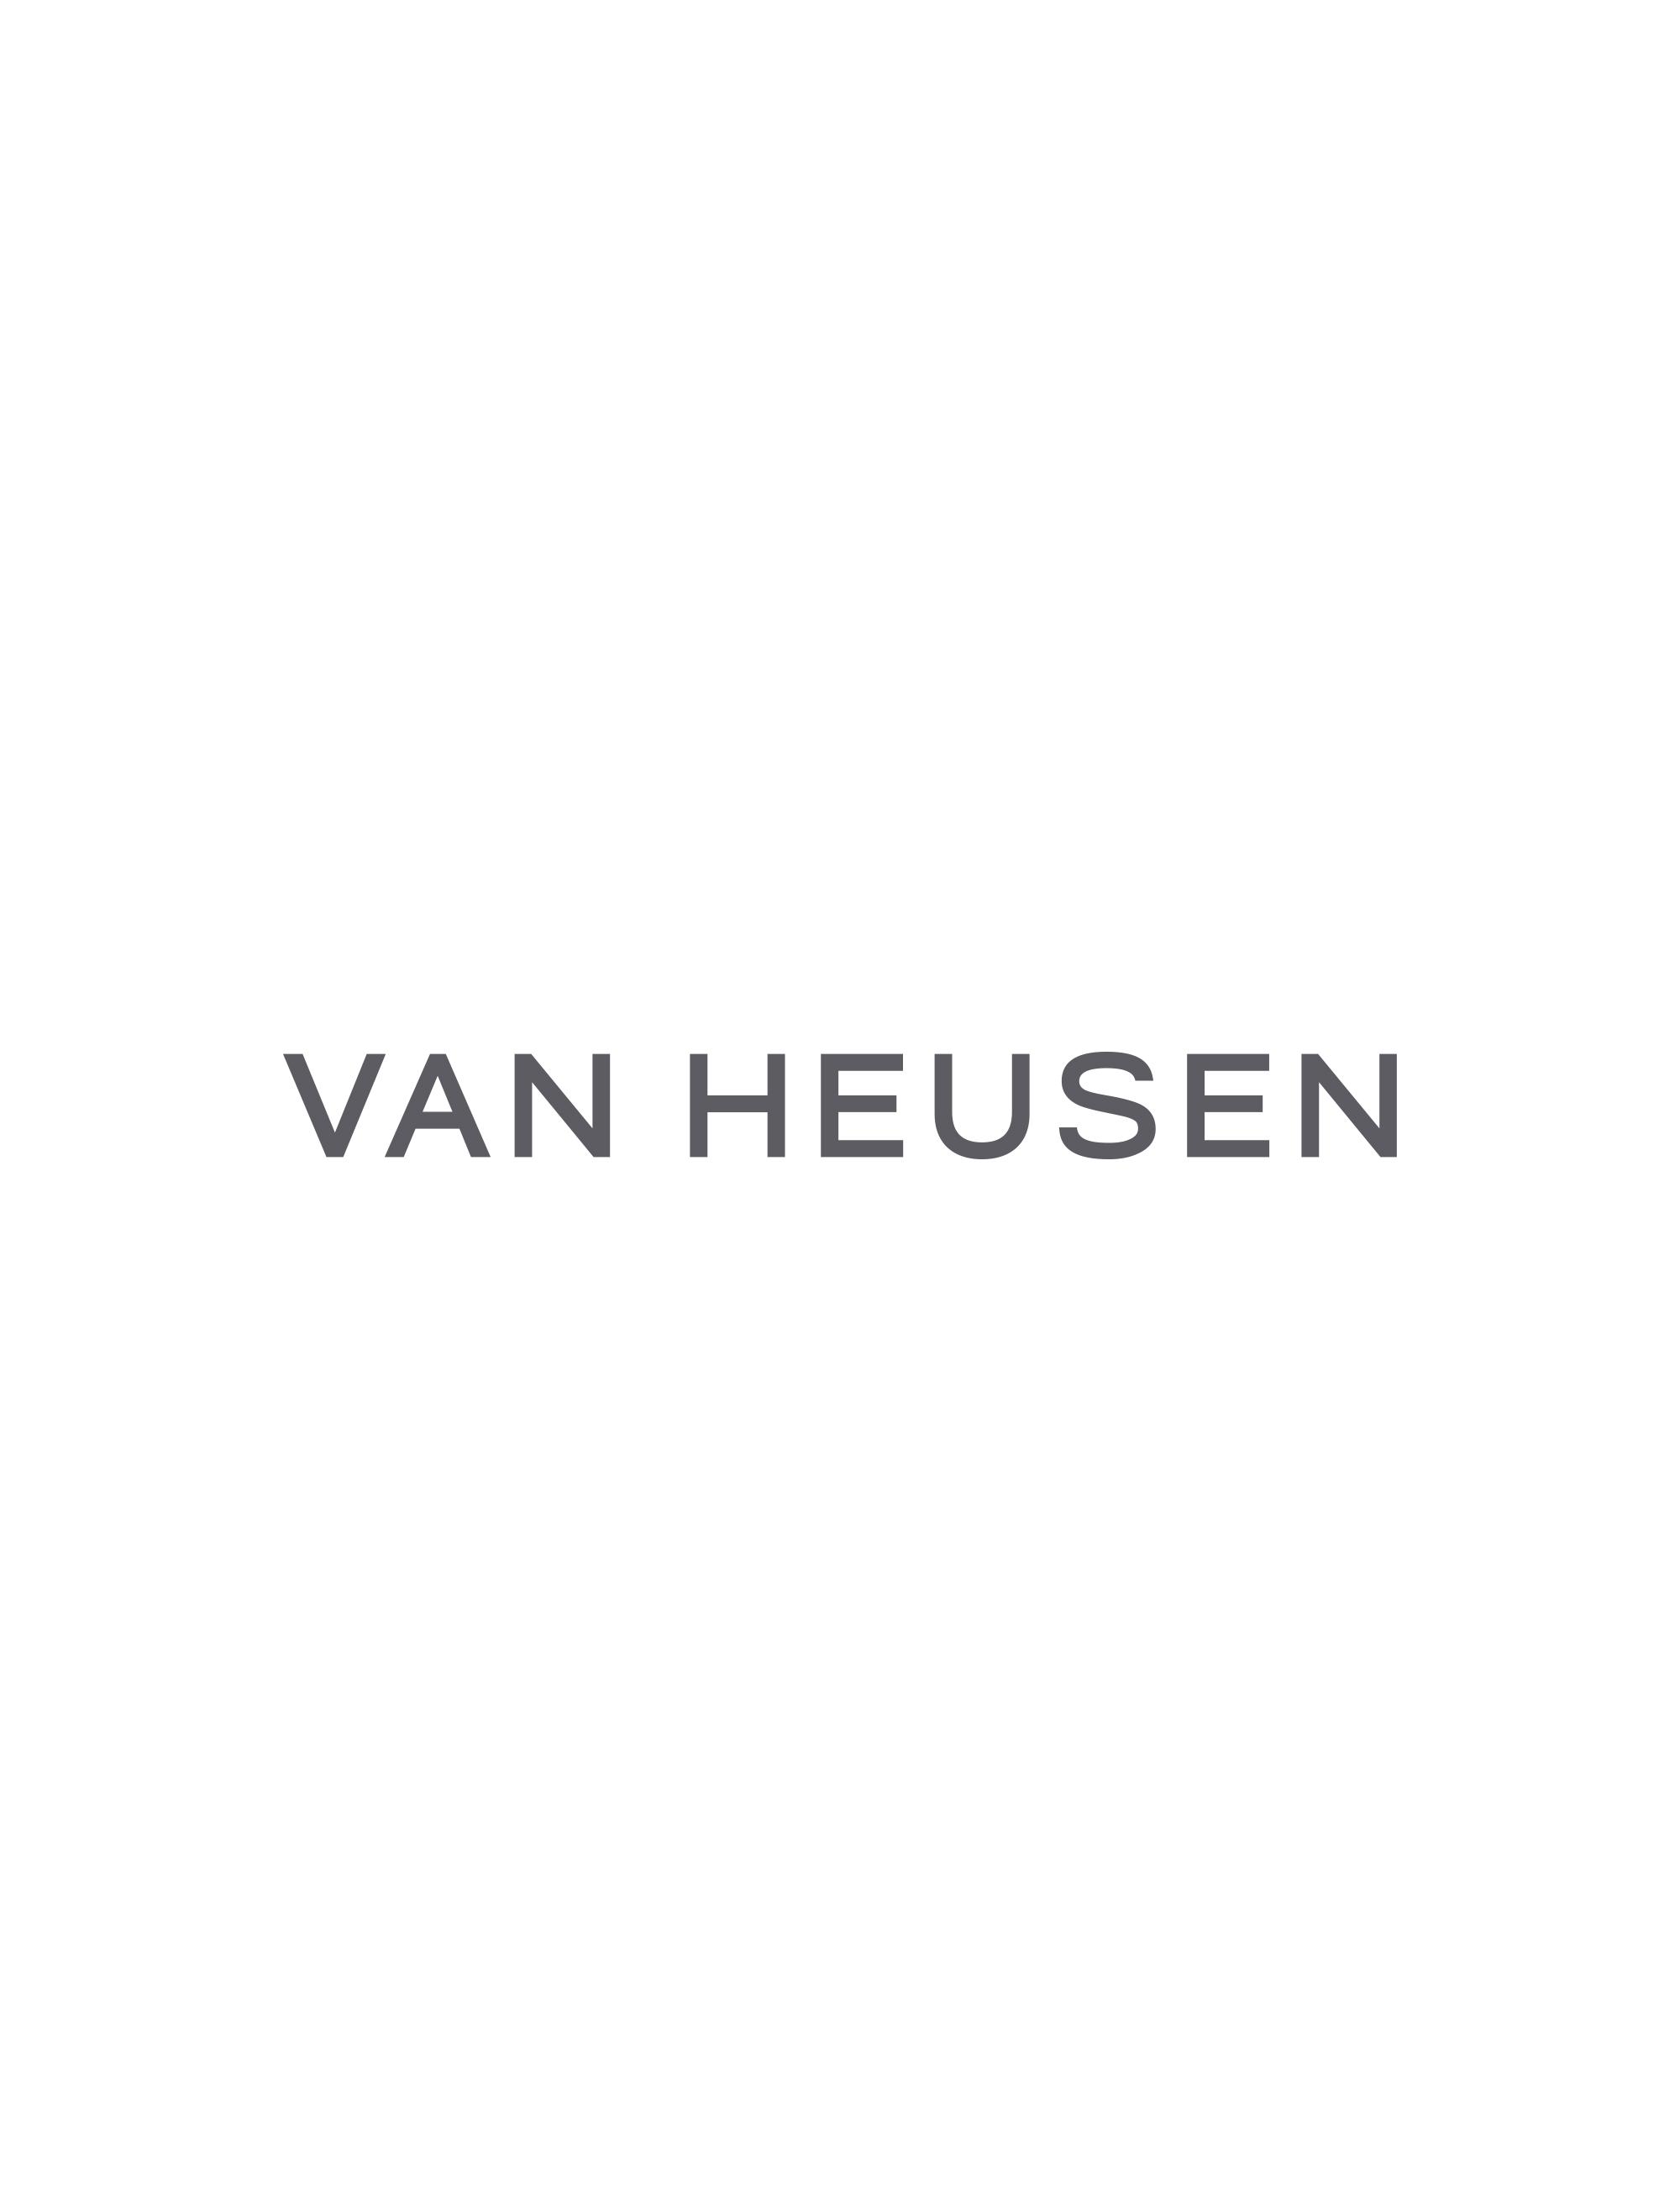 https://pvhba-van-heusen.s3.ap-southeast-2.amazonaws.com/Business-Shirts/VCS399H_CTRR_FL-TP-F1.jpg